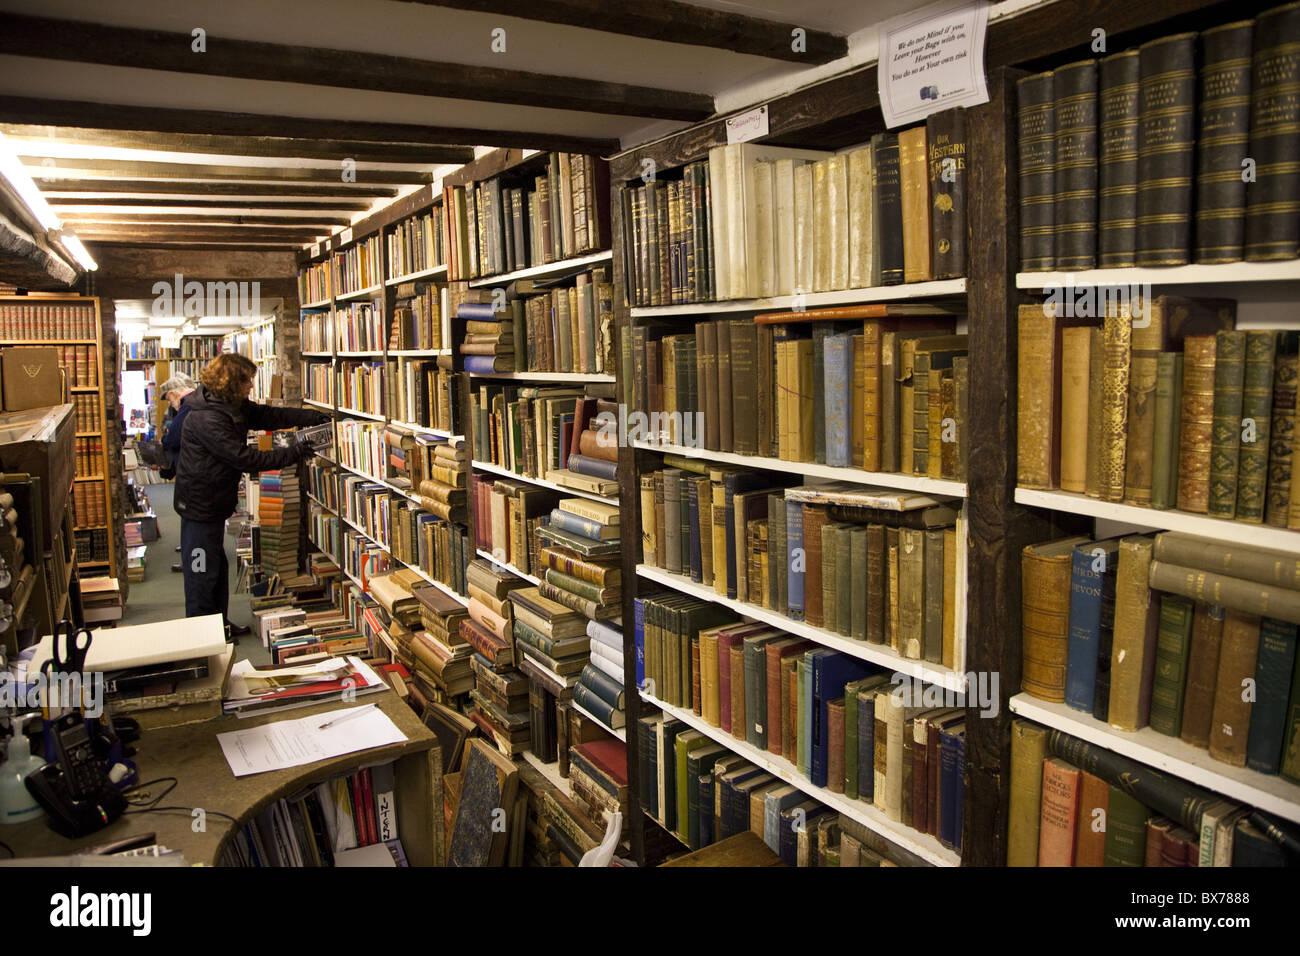 Bookshop in Hay-on-Wye, Powys, Wales, United Kingdom, Europe - Stock Image